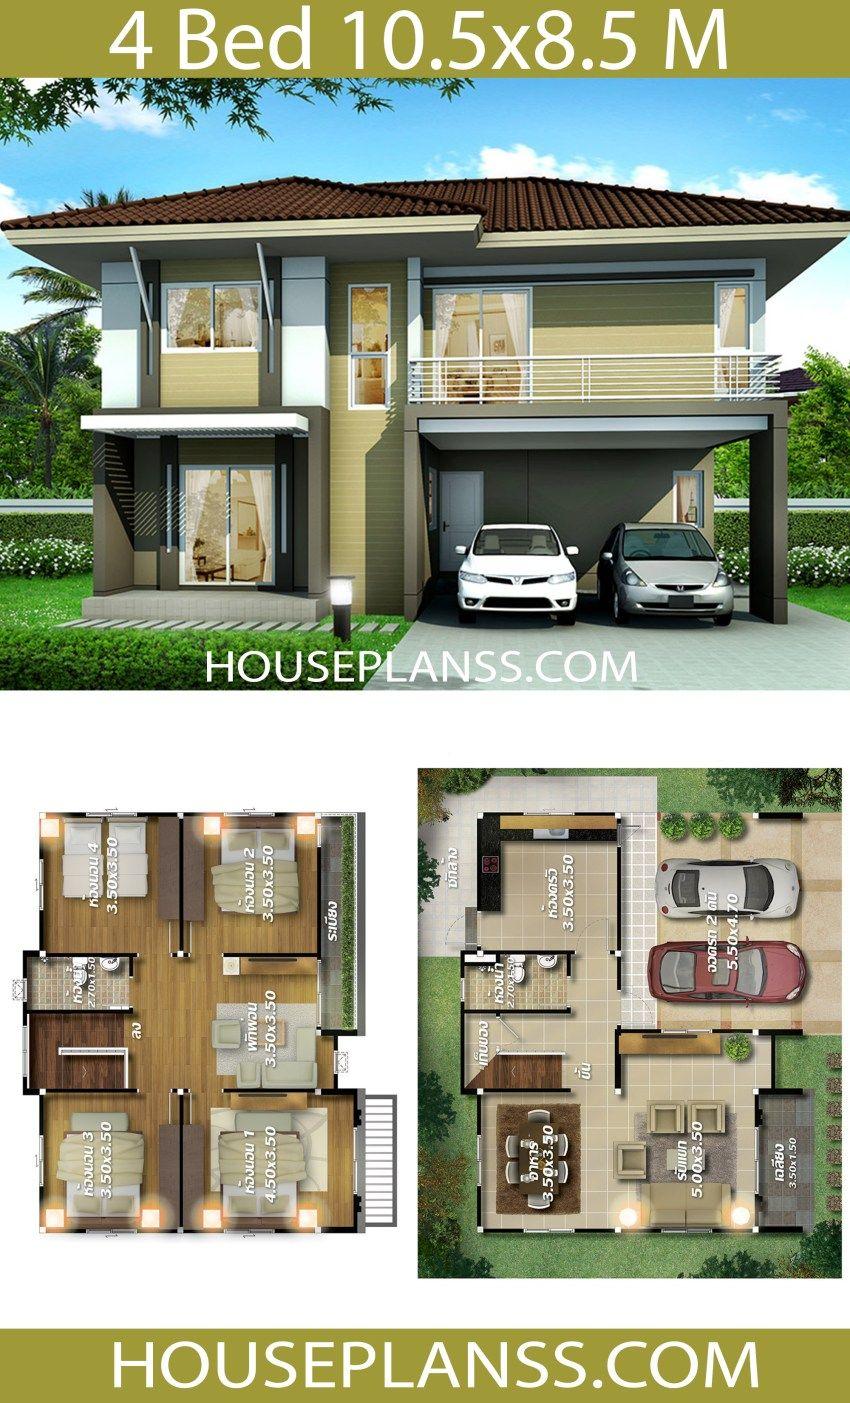 House Plans Idea 10 5x8 5 With 4 Bedrooms House Plans 3d Duplex House Plans Two Story House Design House Architecture Design